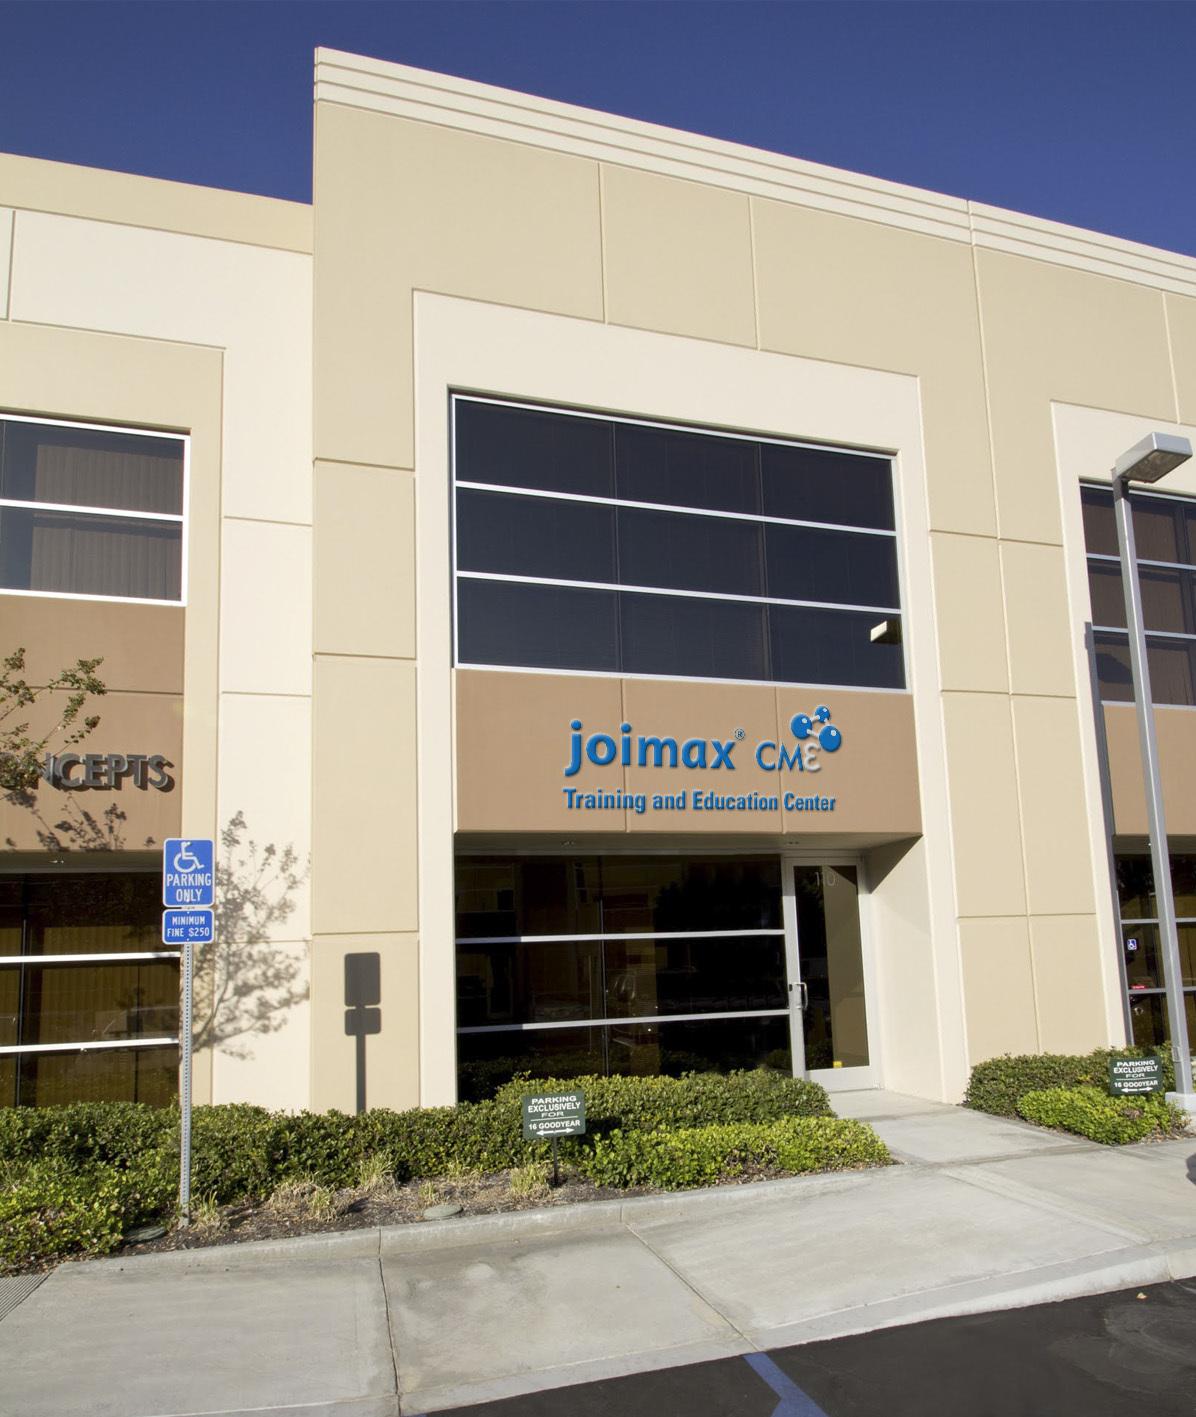 joimax_Training_Education_Center_Irvine_FINAL_VERSION.jpg